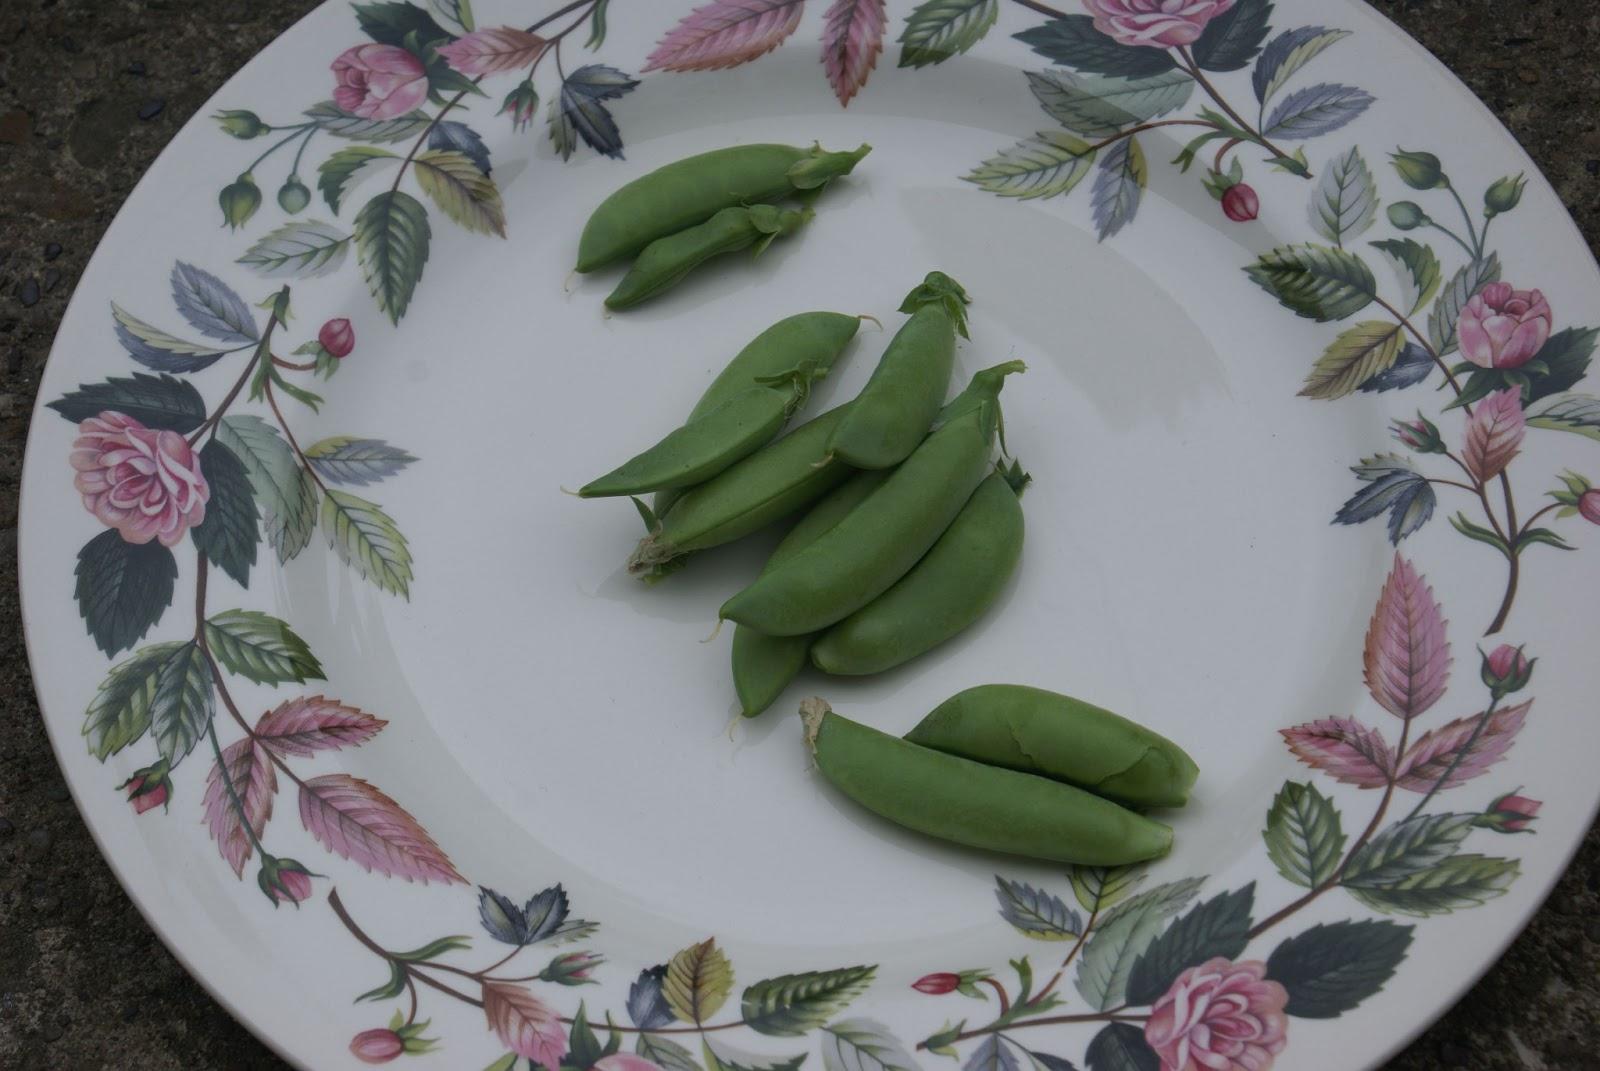 Practically Penniless Garden harvest